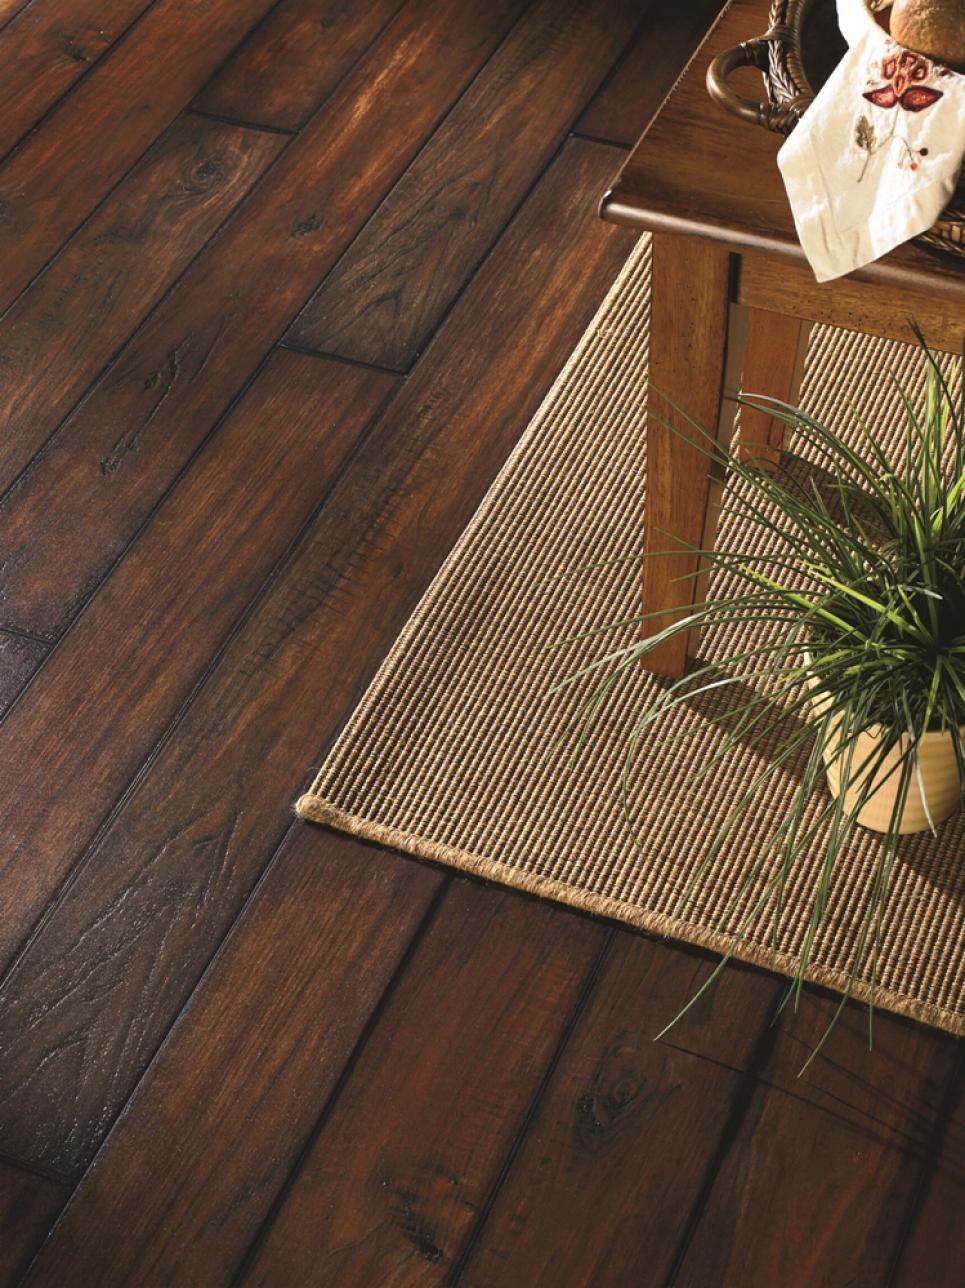 Tile Flooring Options Wood Tile Floors Doors And Floors Ceramic Wood Tile Floor